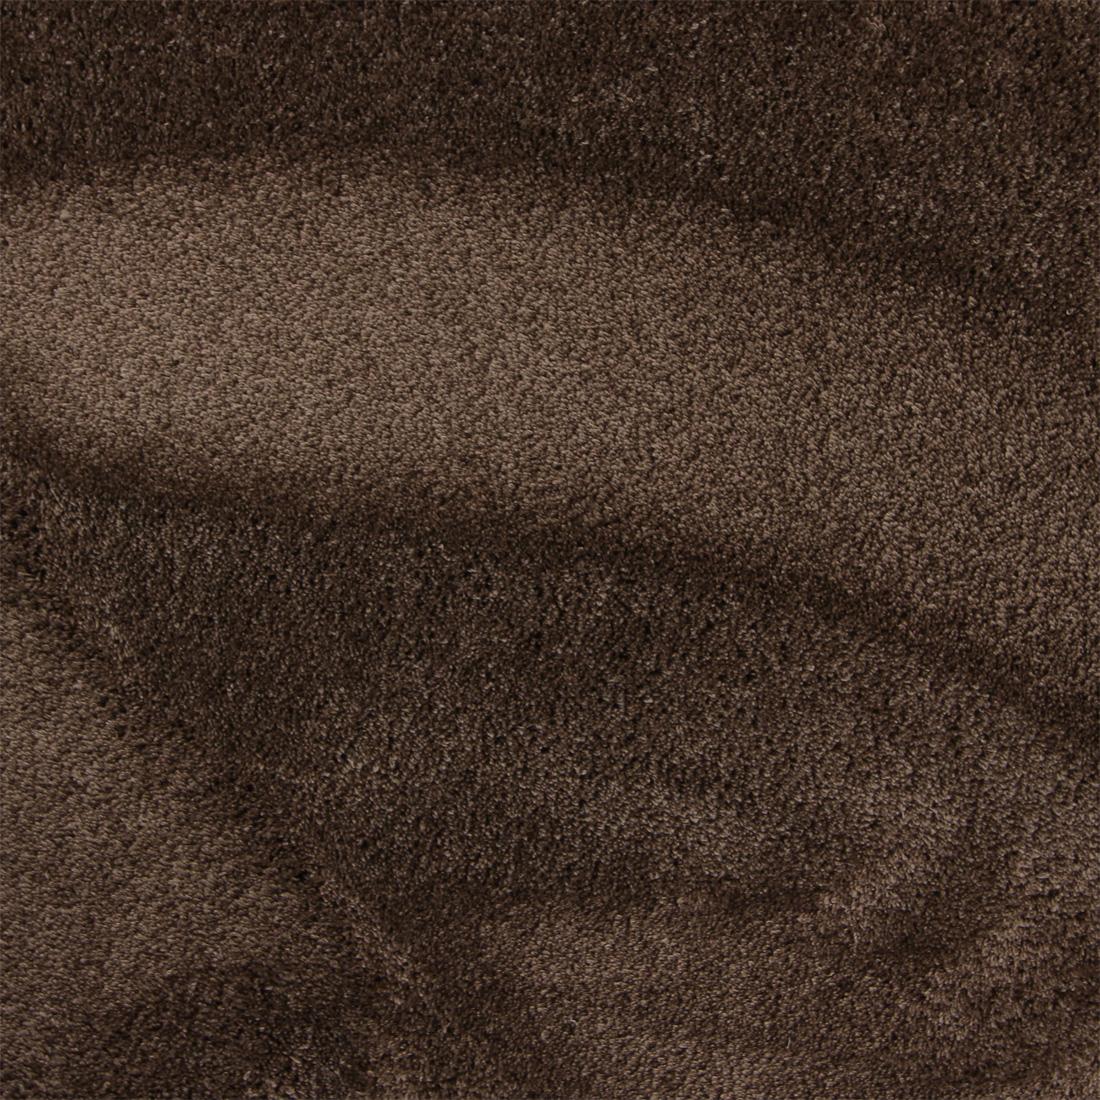 Rond Vloerkleed Xilento Silky Soft Koper